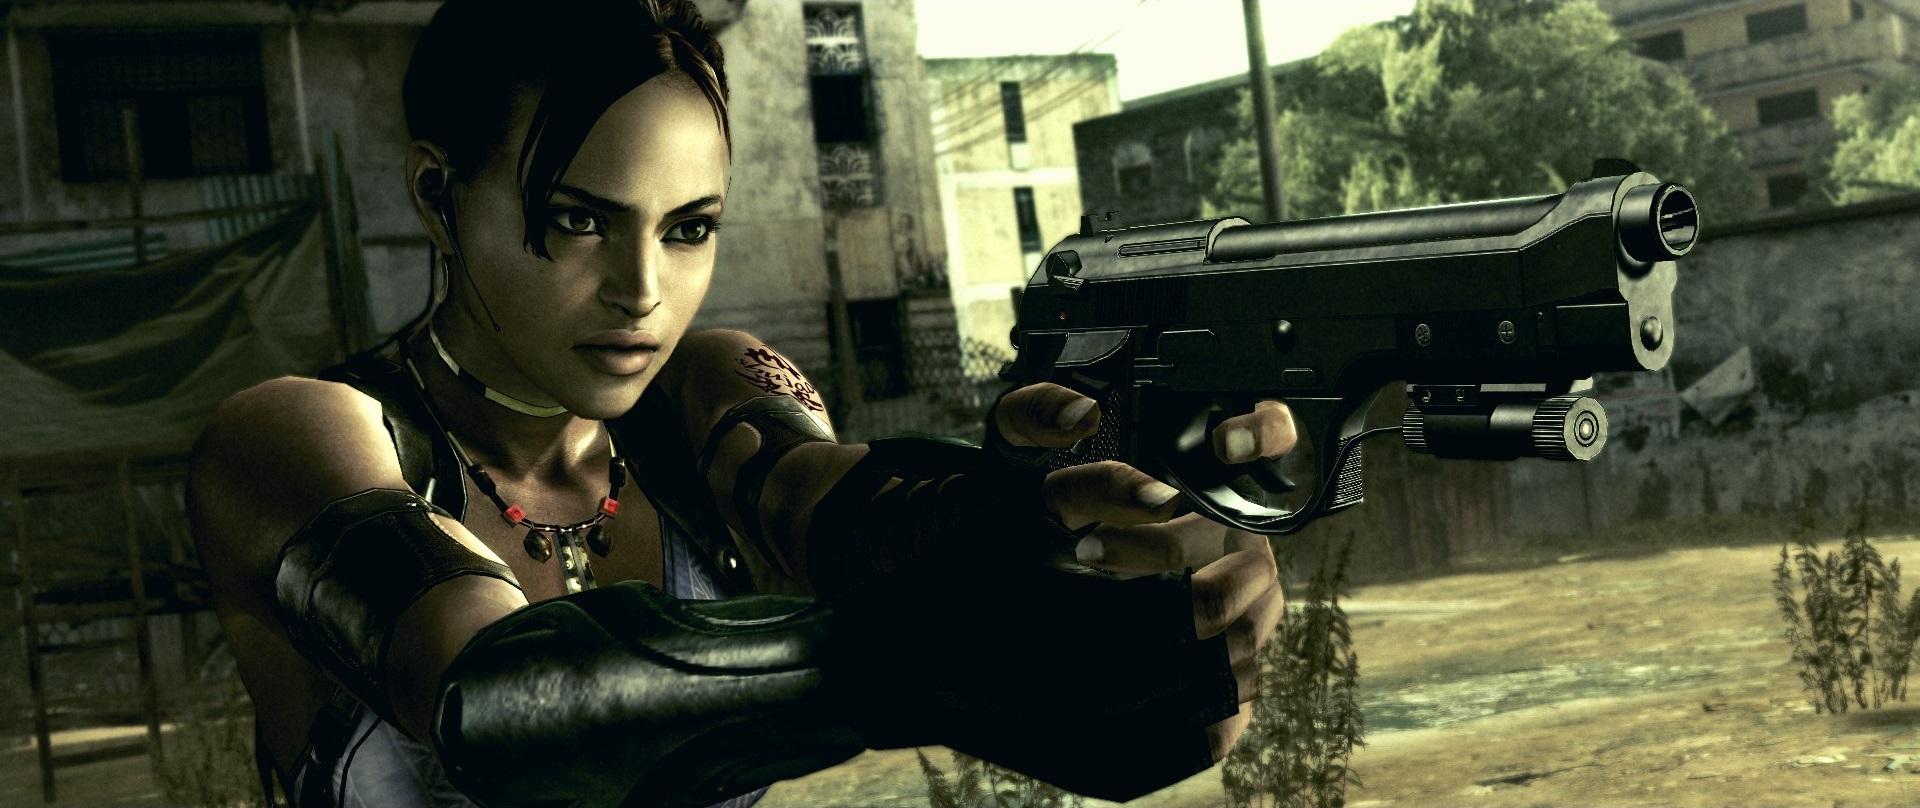 Resident Evil 5 gains Steamworks support, but GFWL DLC won't transfer (Update)